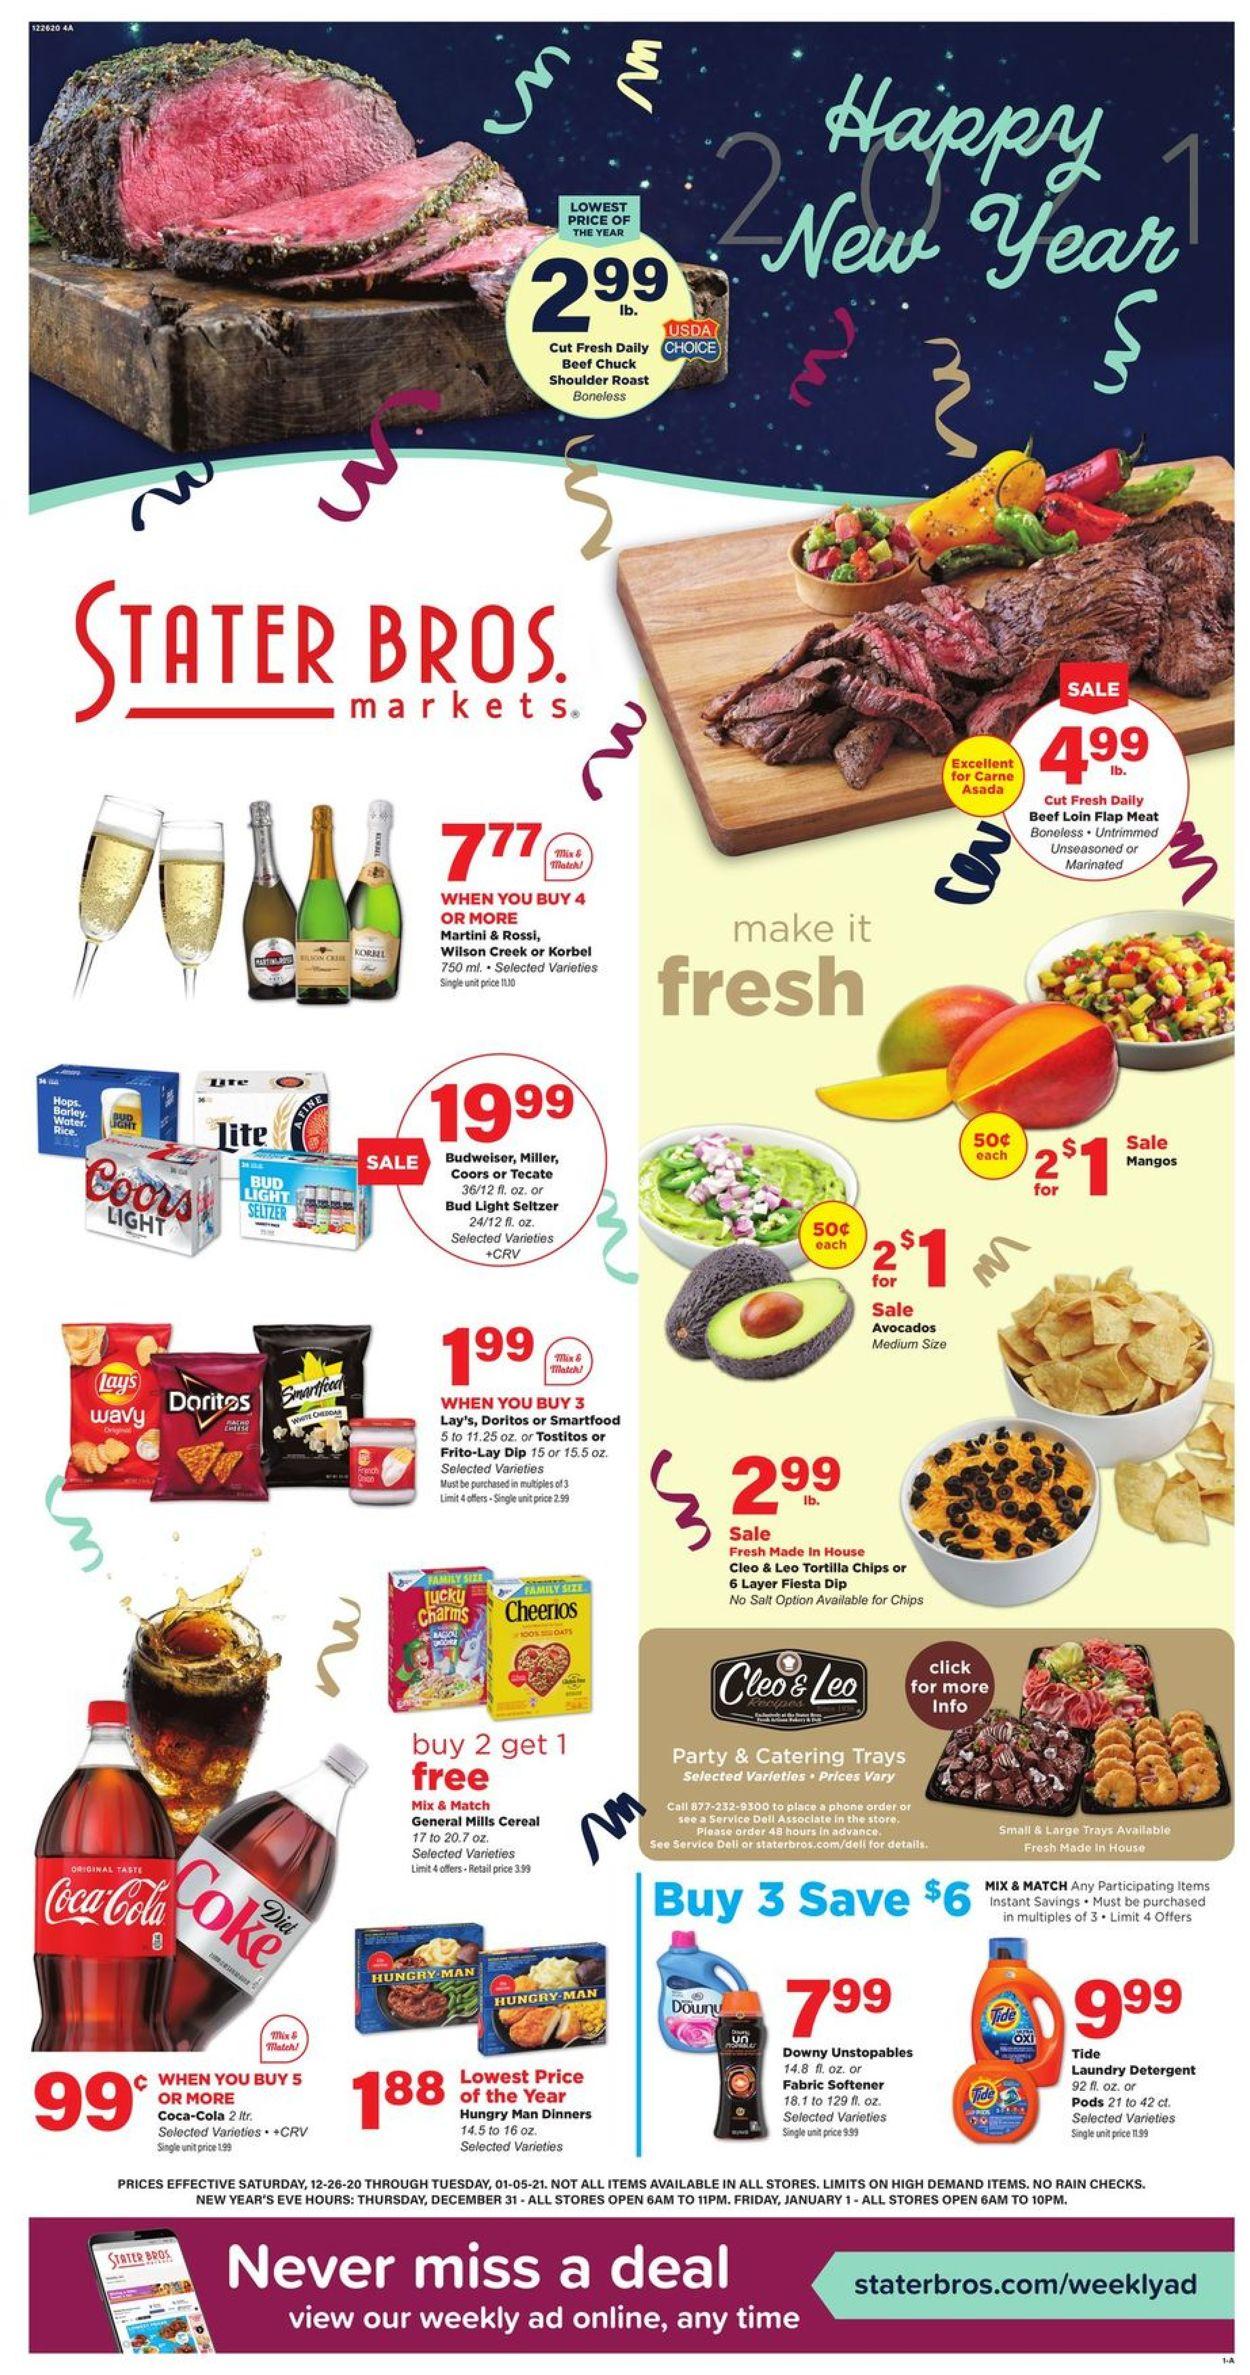 Stater Bros. Happy New Year 2021 Weekly Ad Circular - valid 12/26-01/05/2021